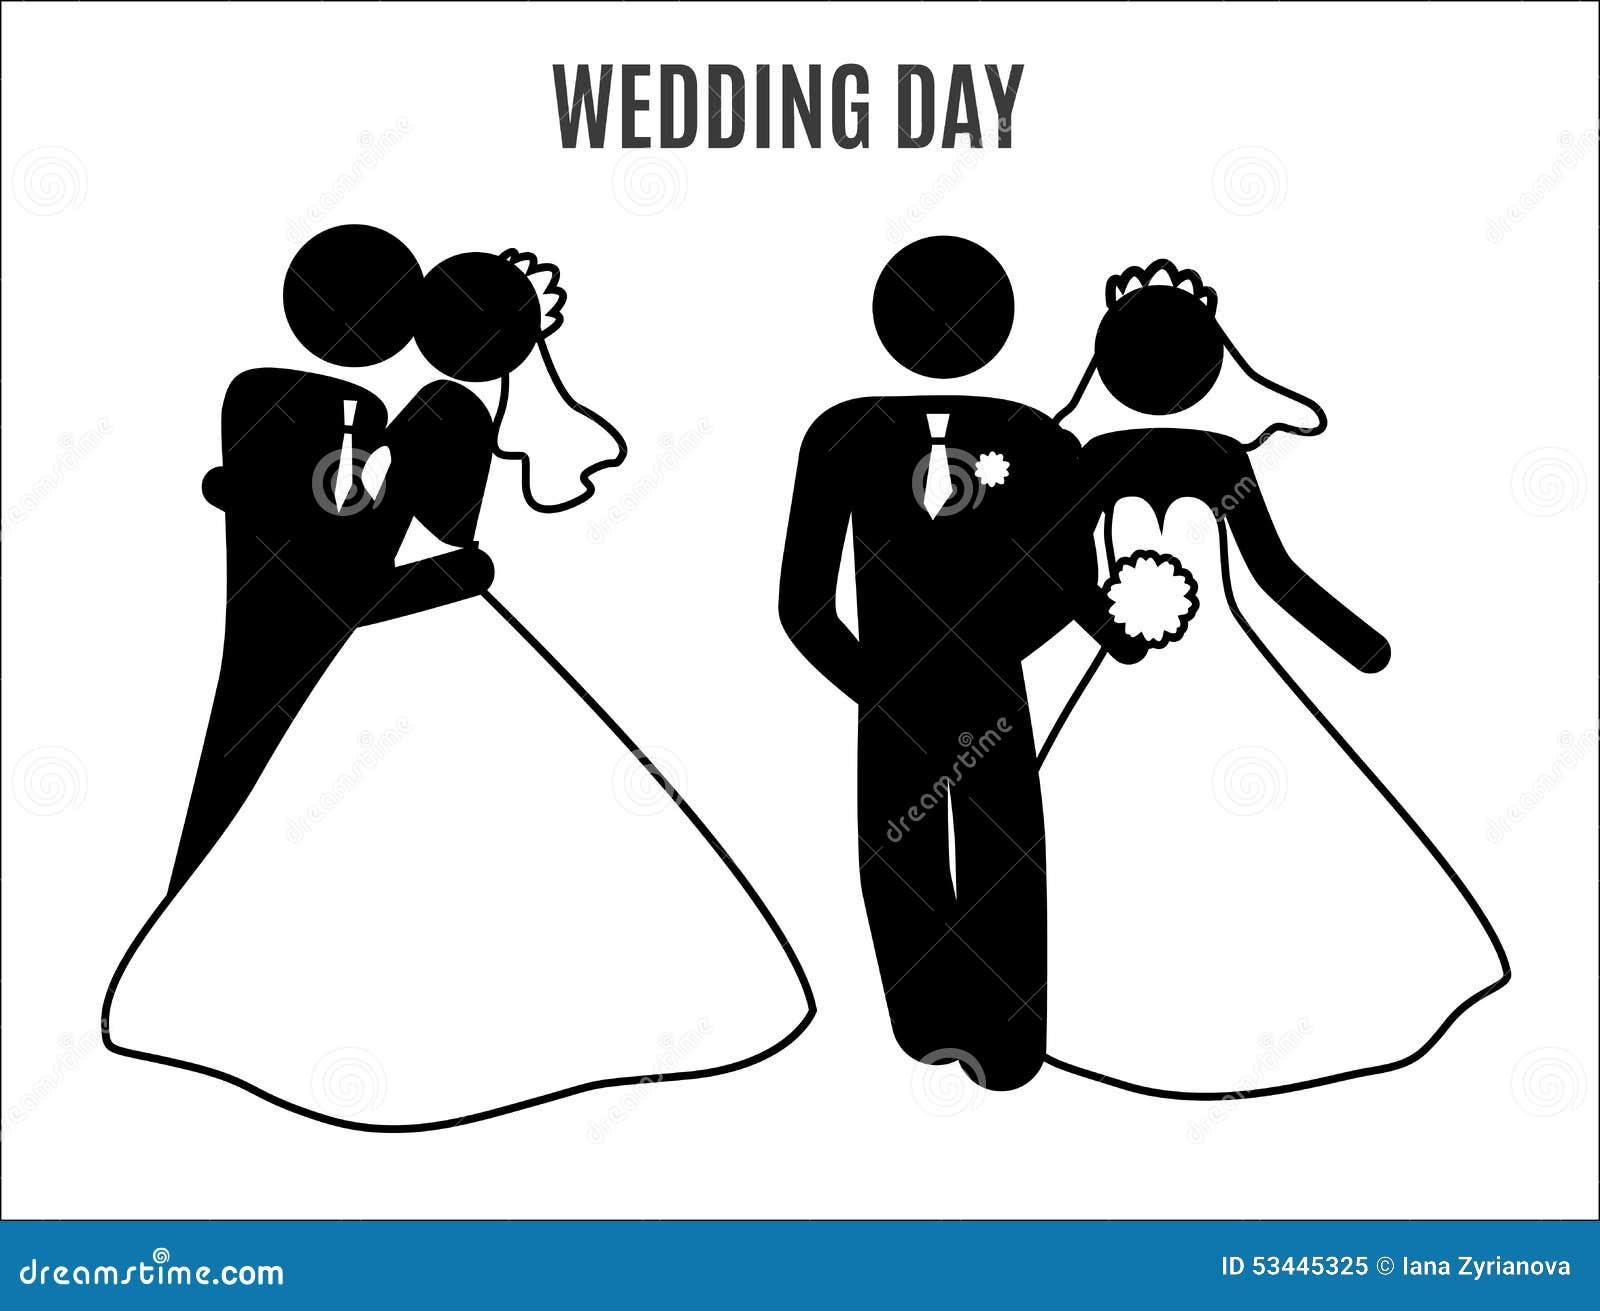 wedding family icon stick figure stock illustration illustration